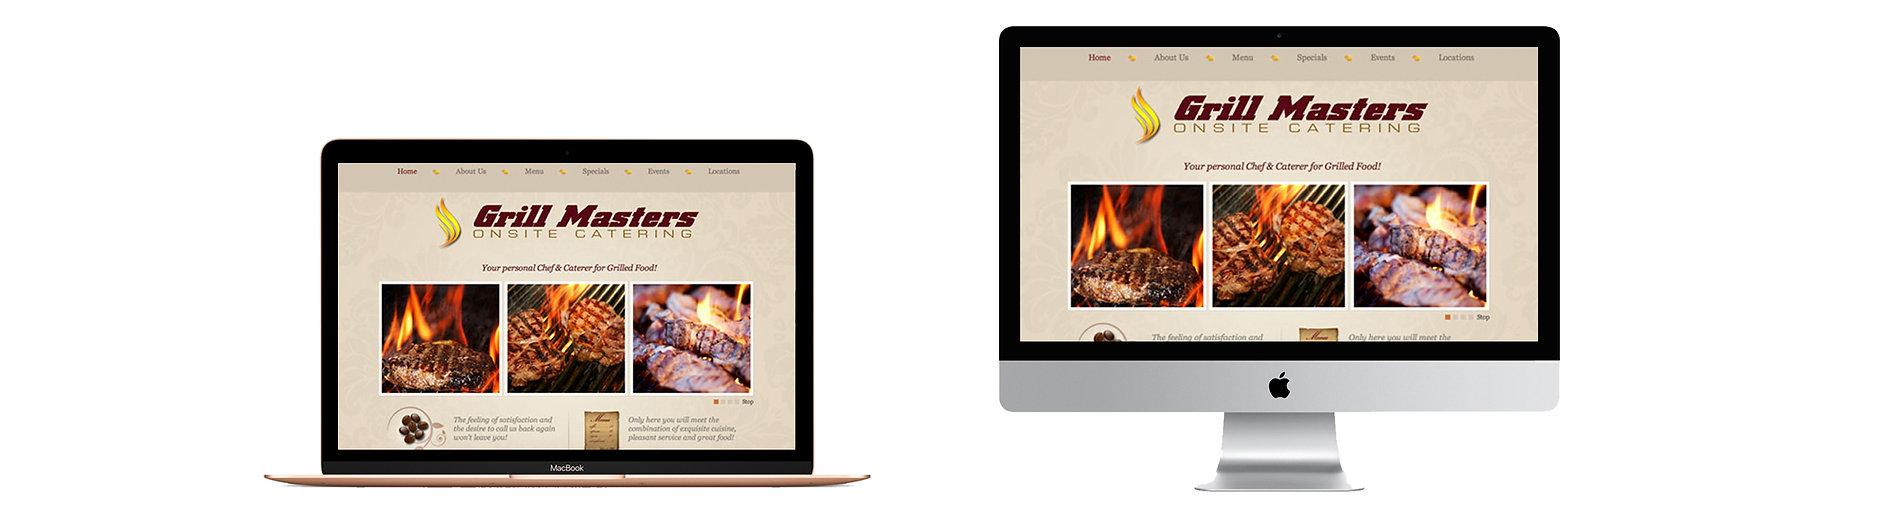 Websites_Stories_Grill Masters.jpg